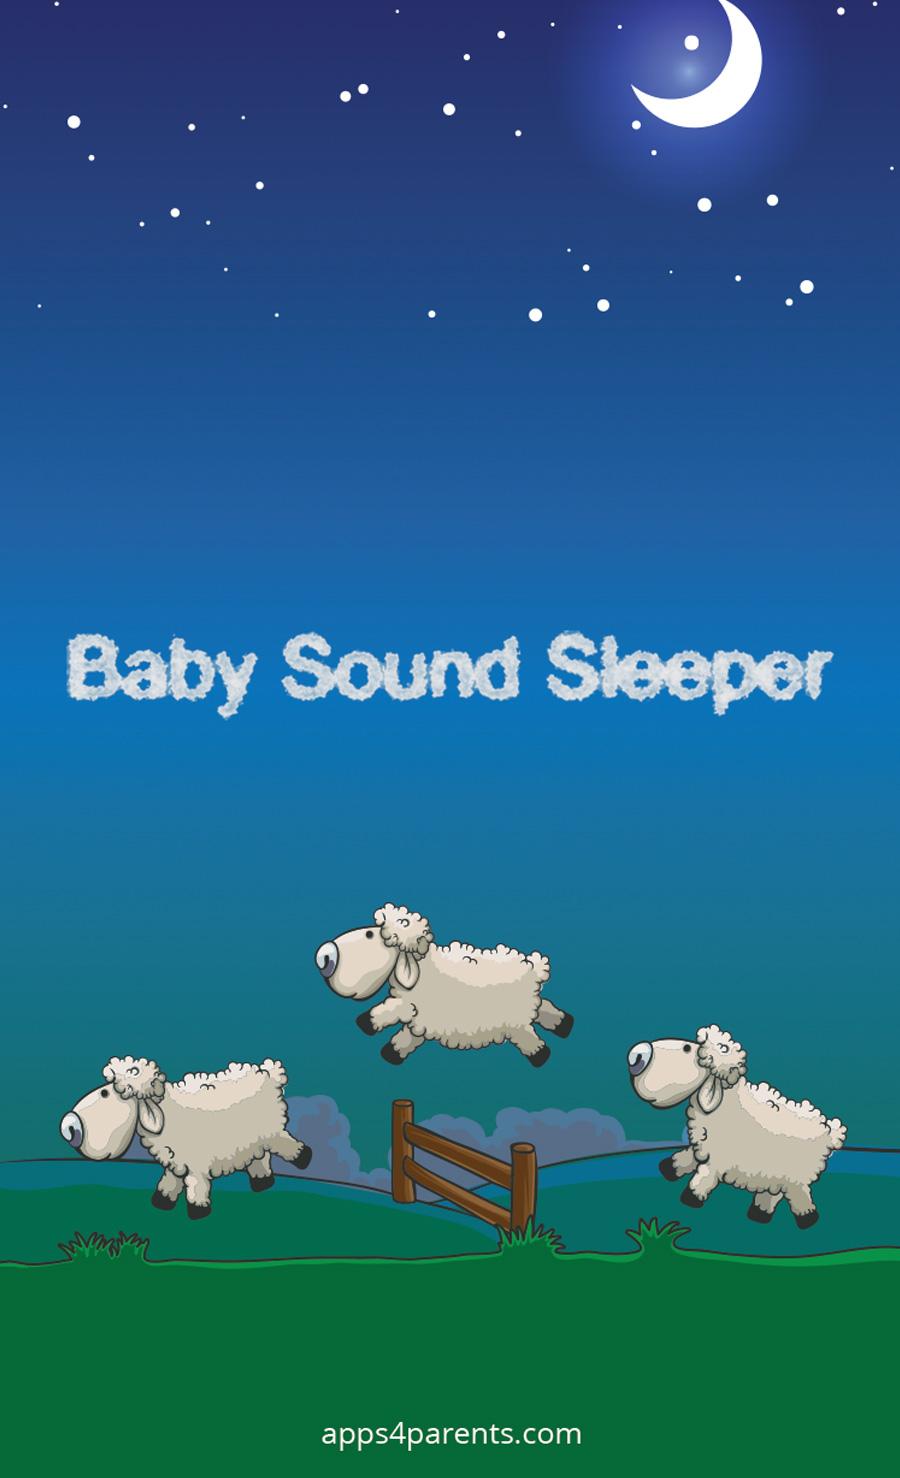 Baby Sound Sleeper